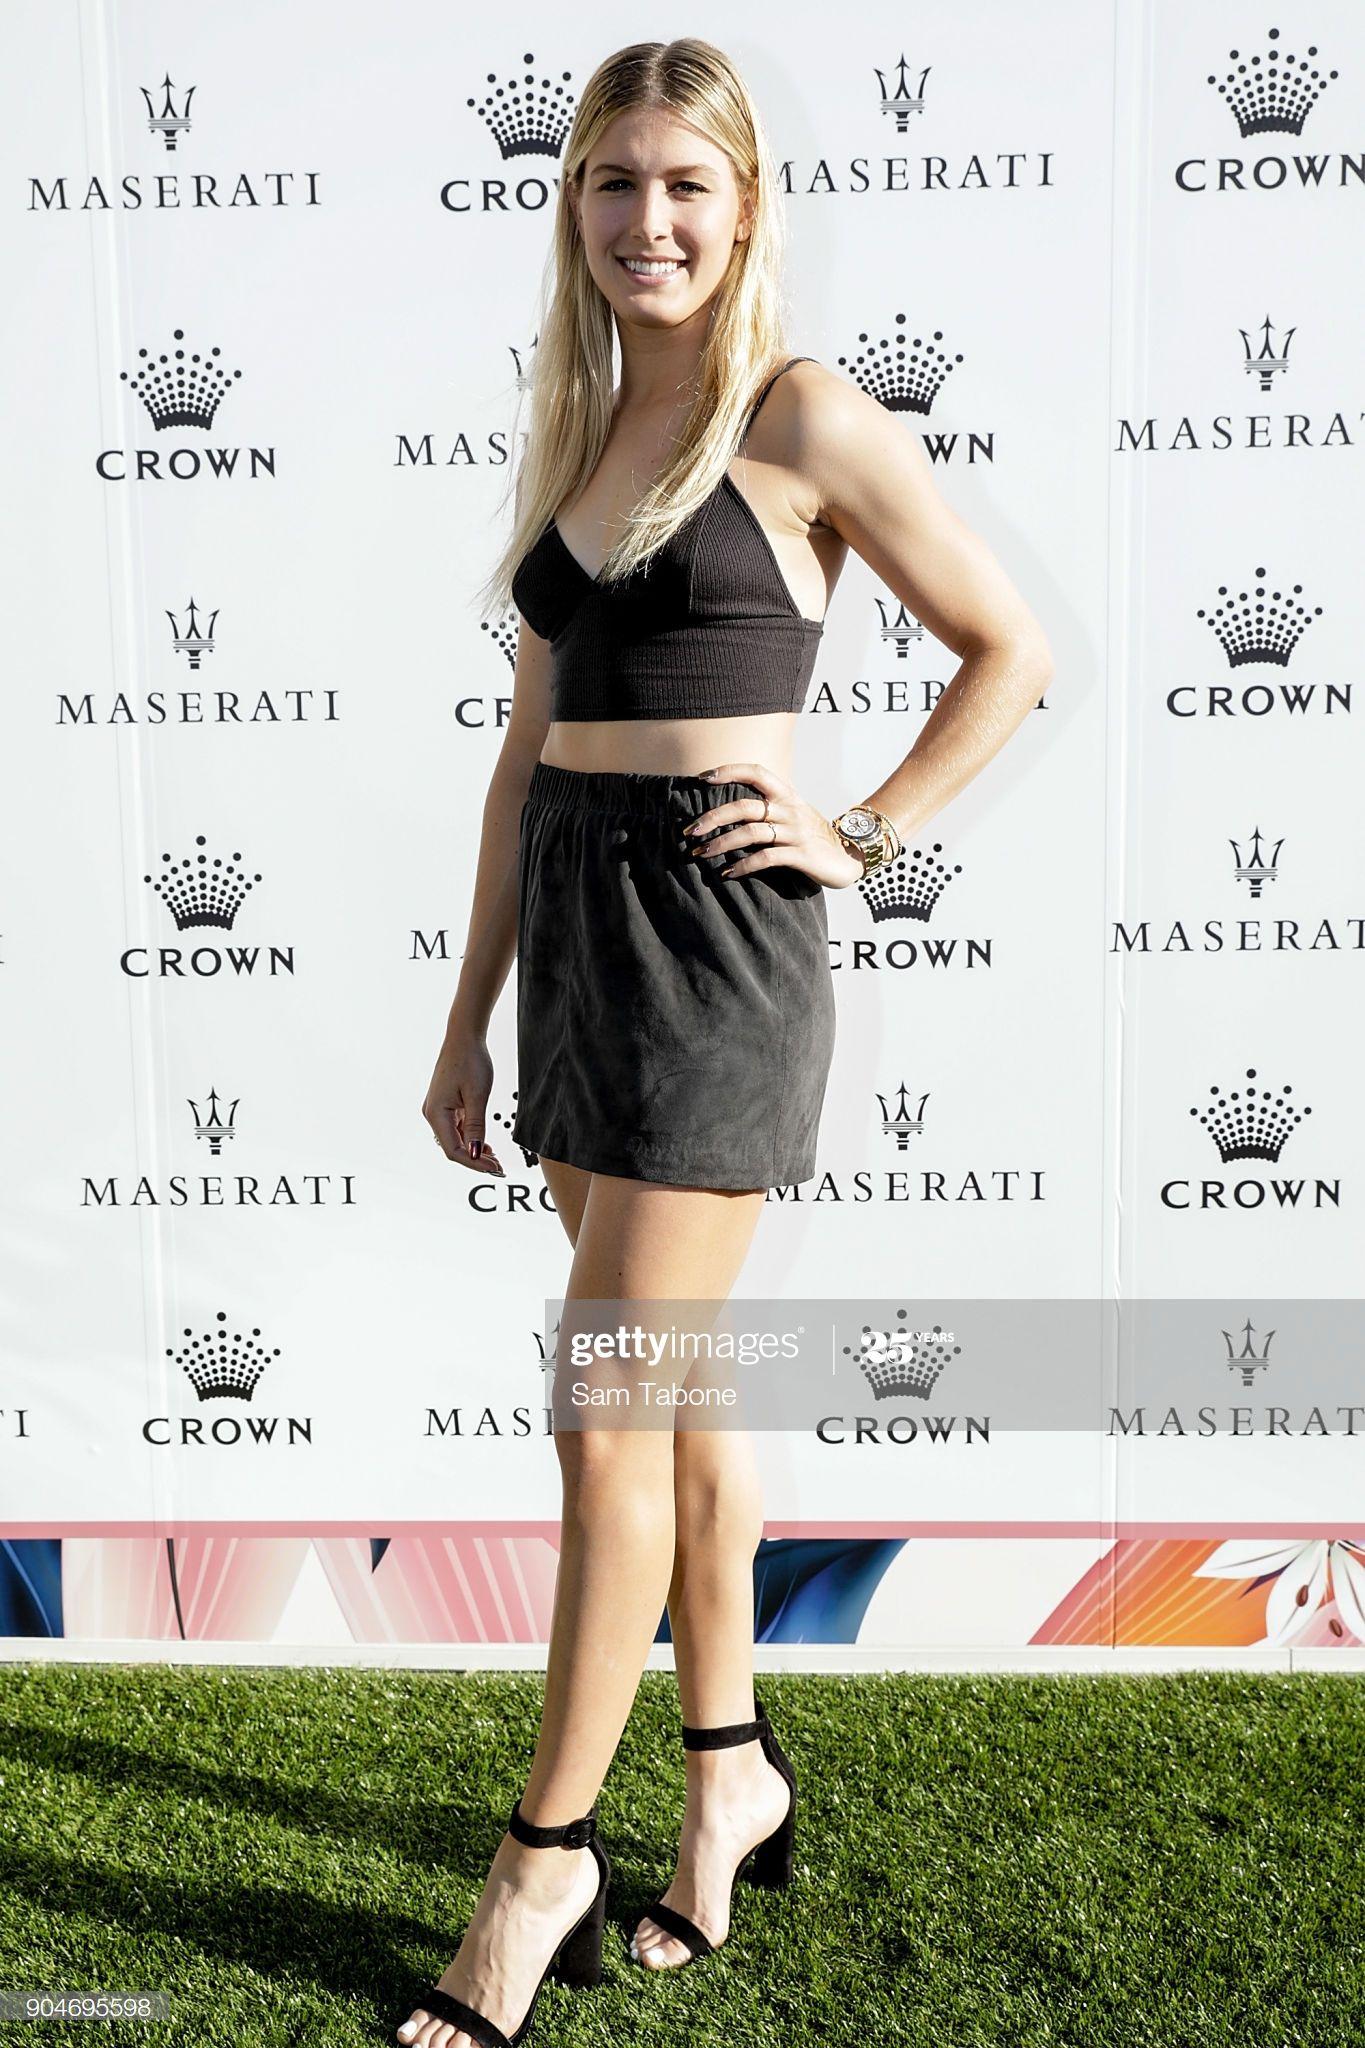 Pin By Gerardo Olvera Rosete On Eug In 2020 Eugenie Bouchard Tennis Players Female Tennis Players